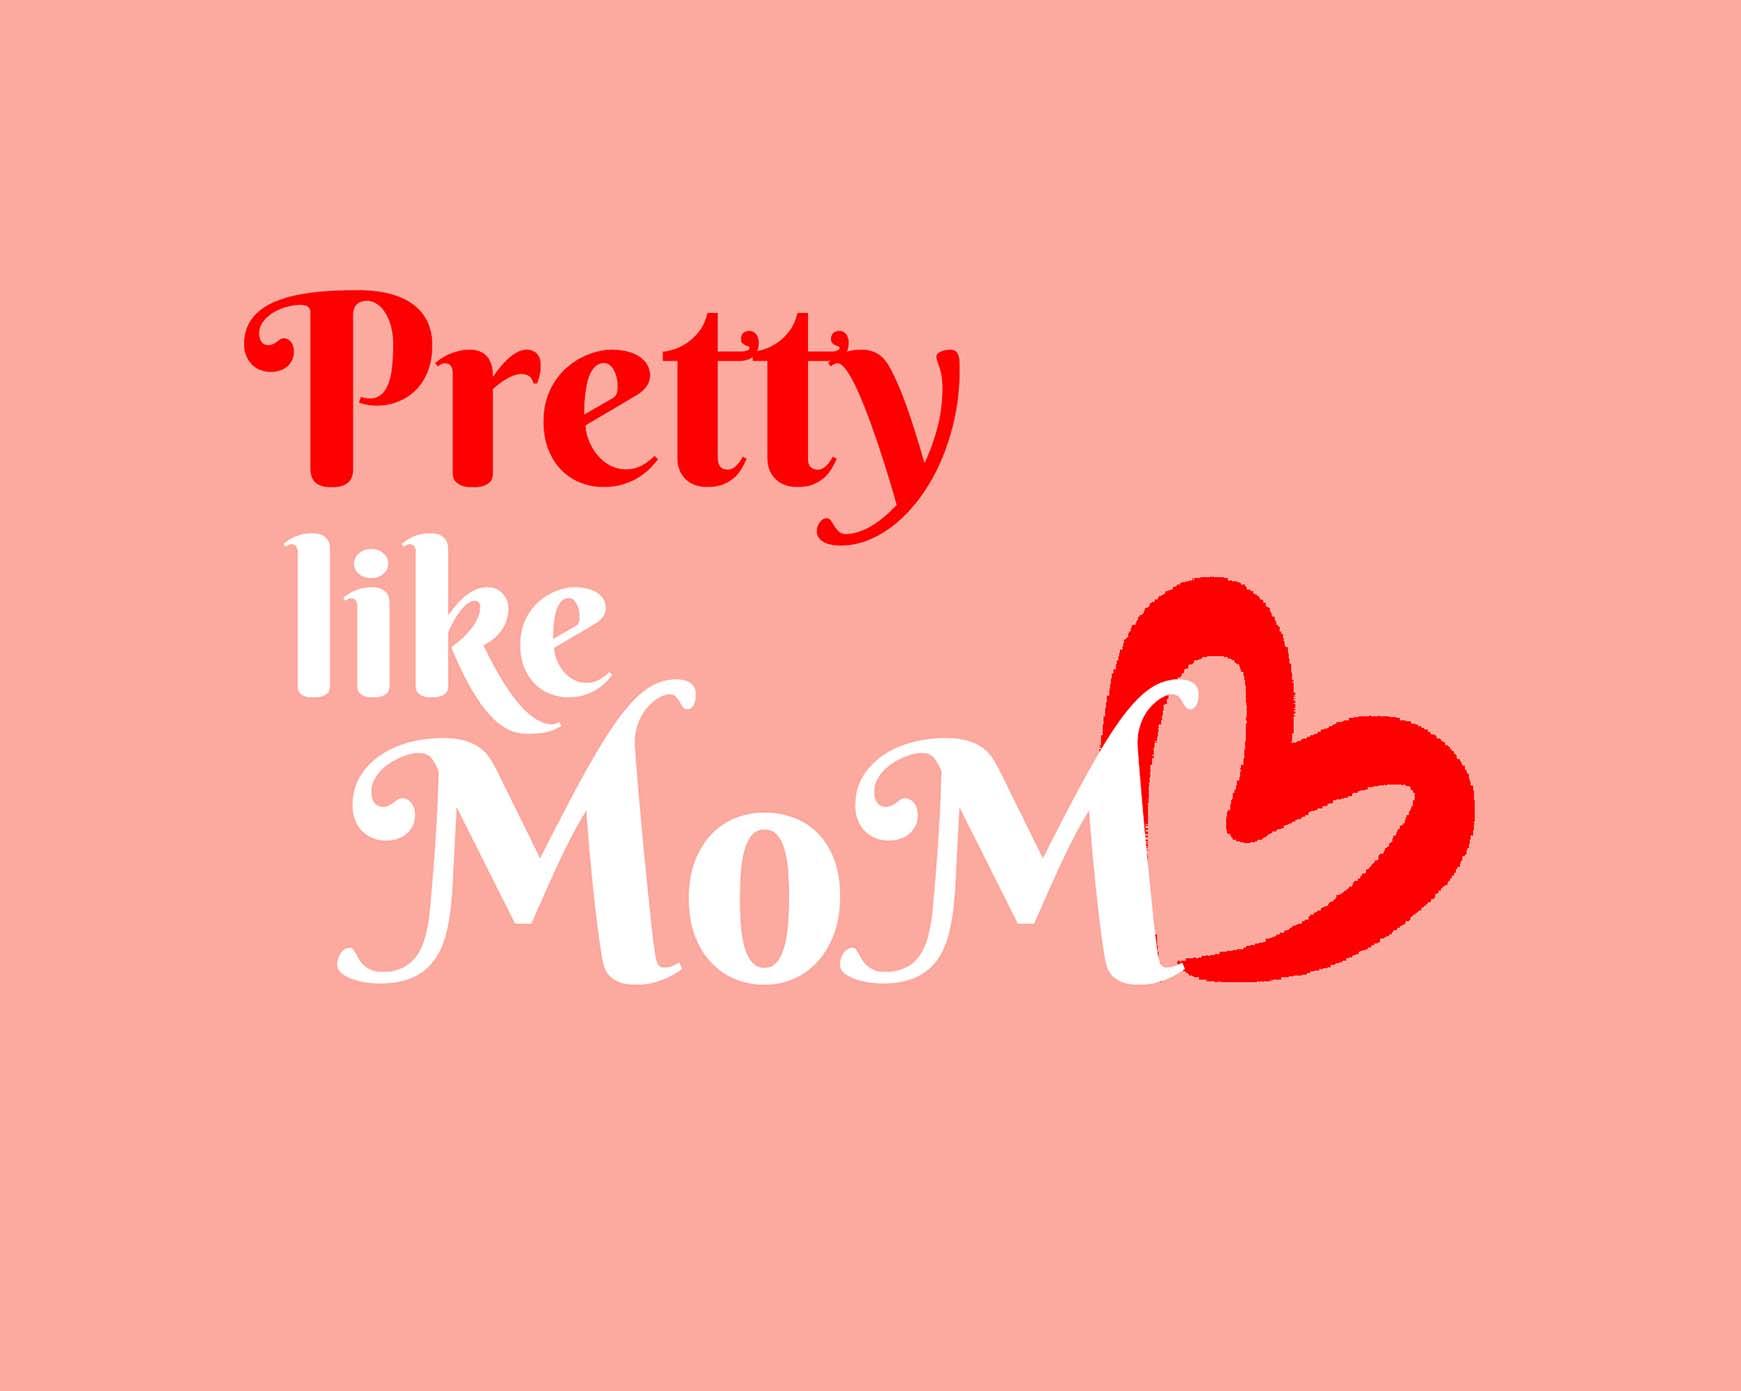 322-pretty-like-mom.jpg